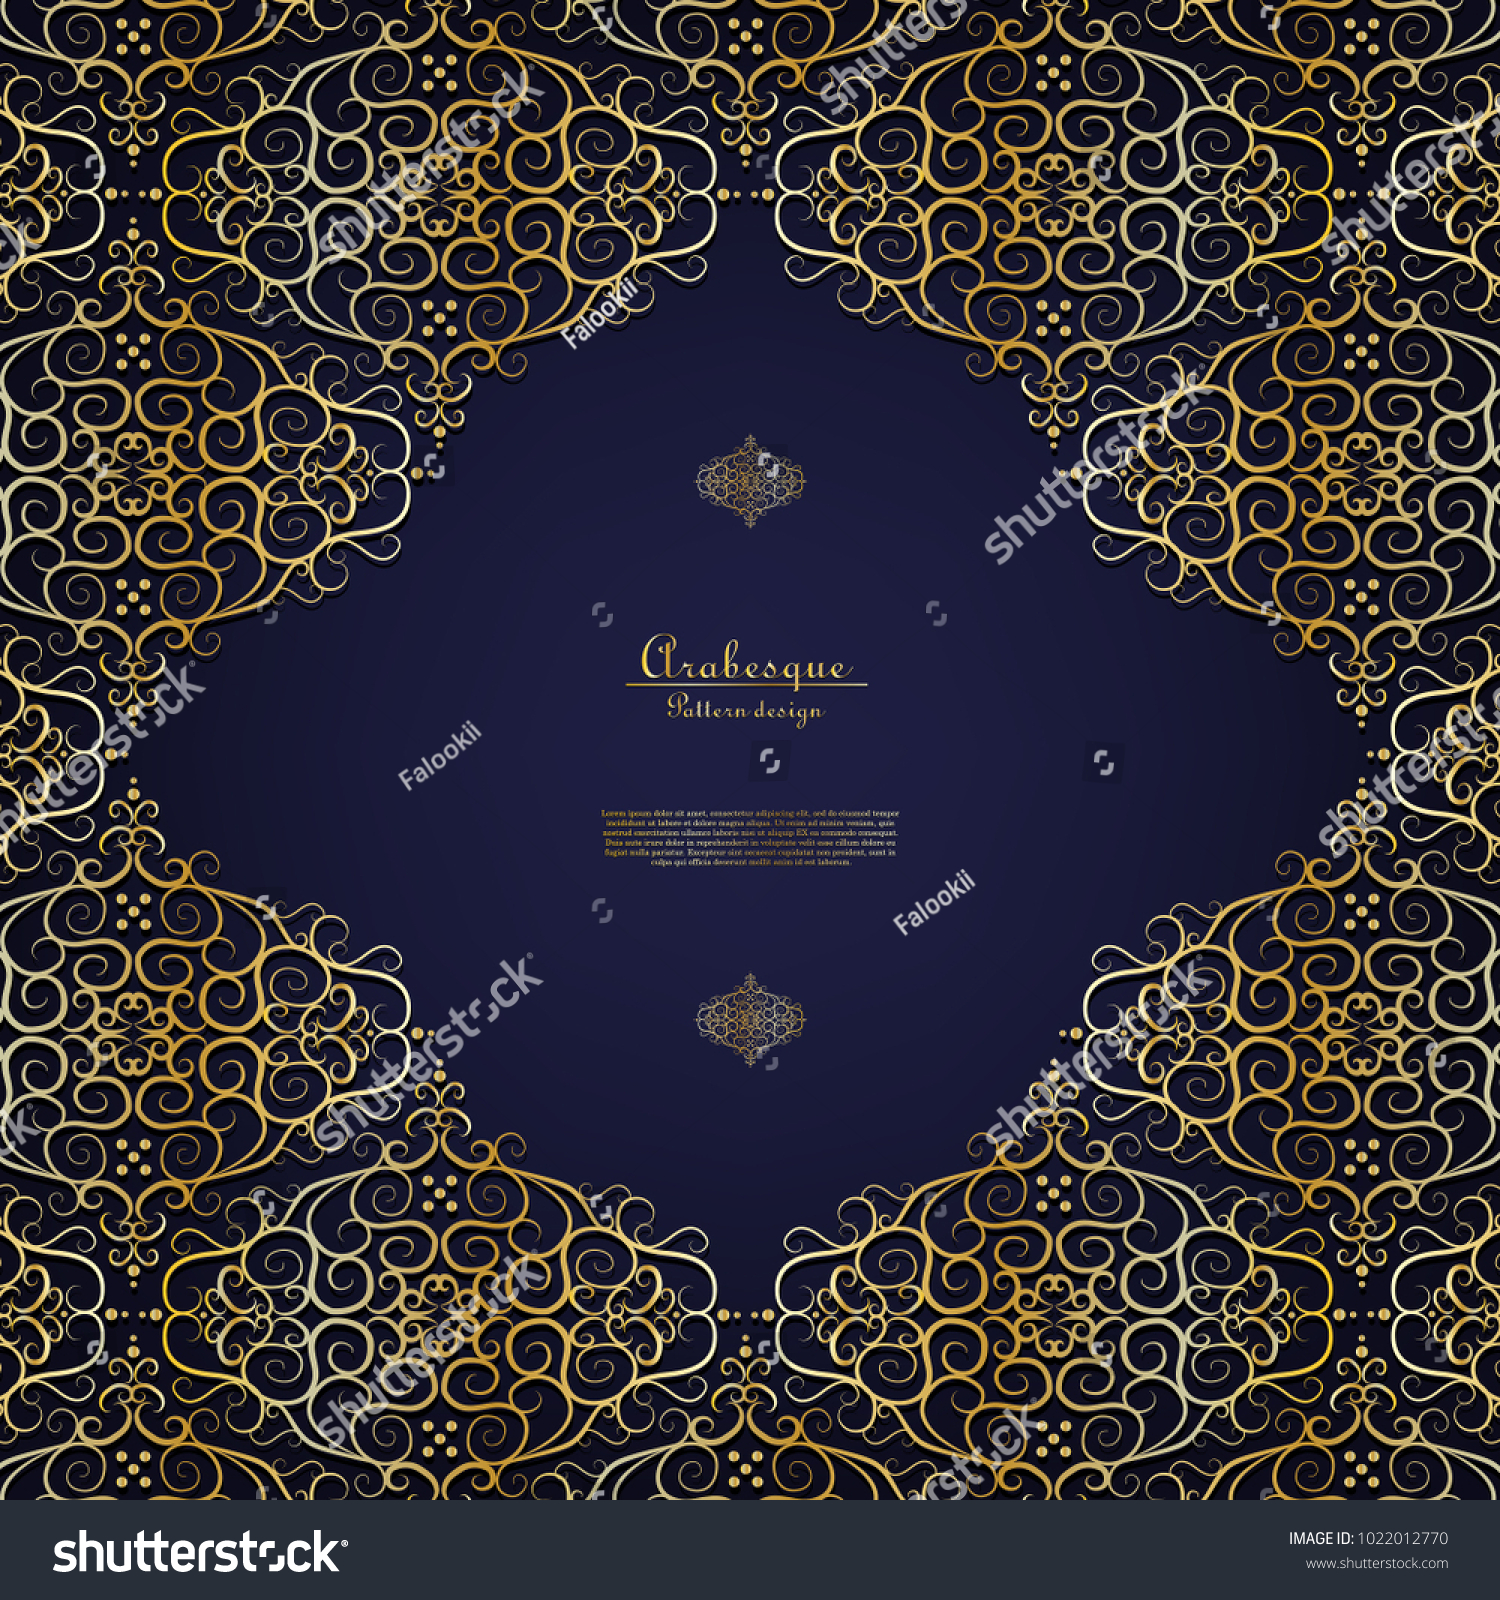 Arabesque Blue Element Gold Flower Background Template Vector Design